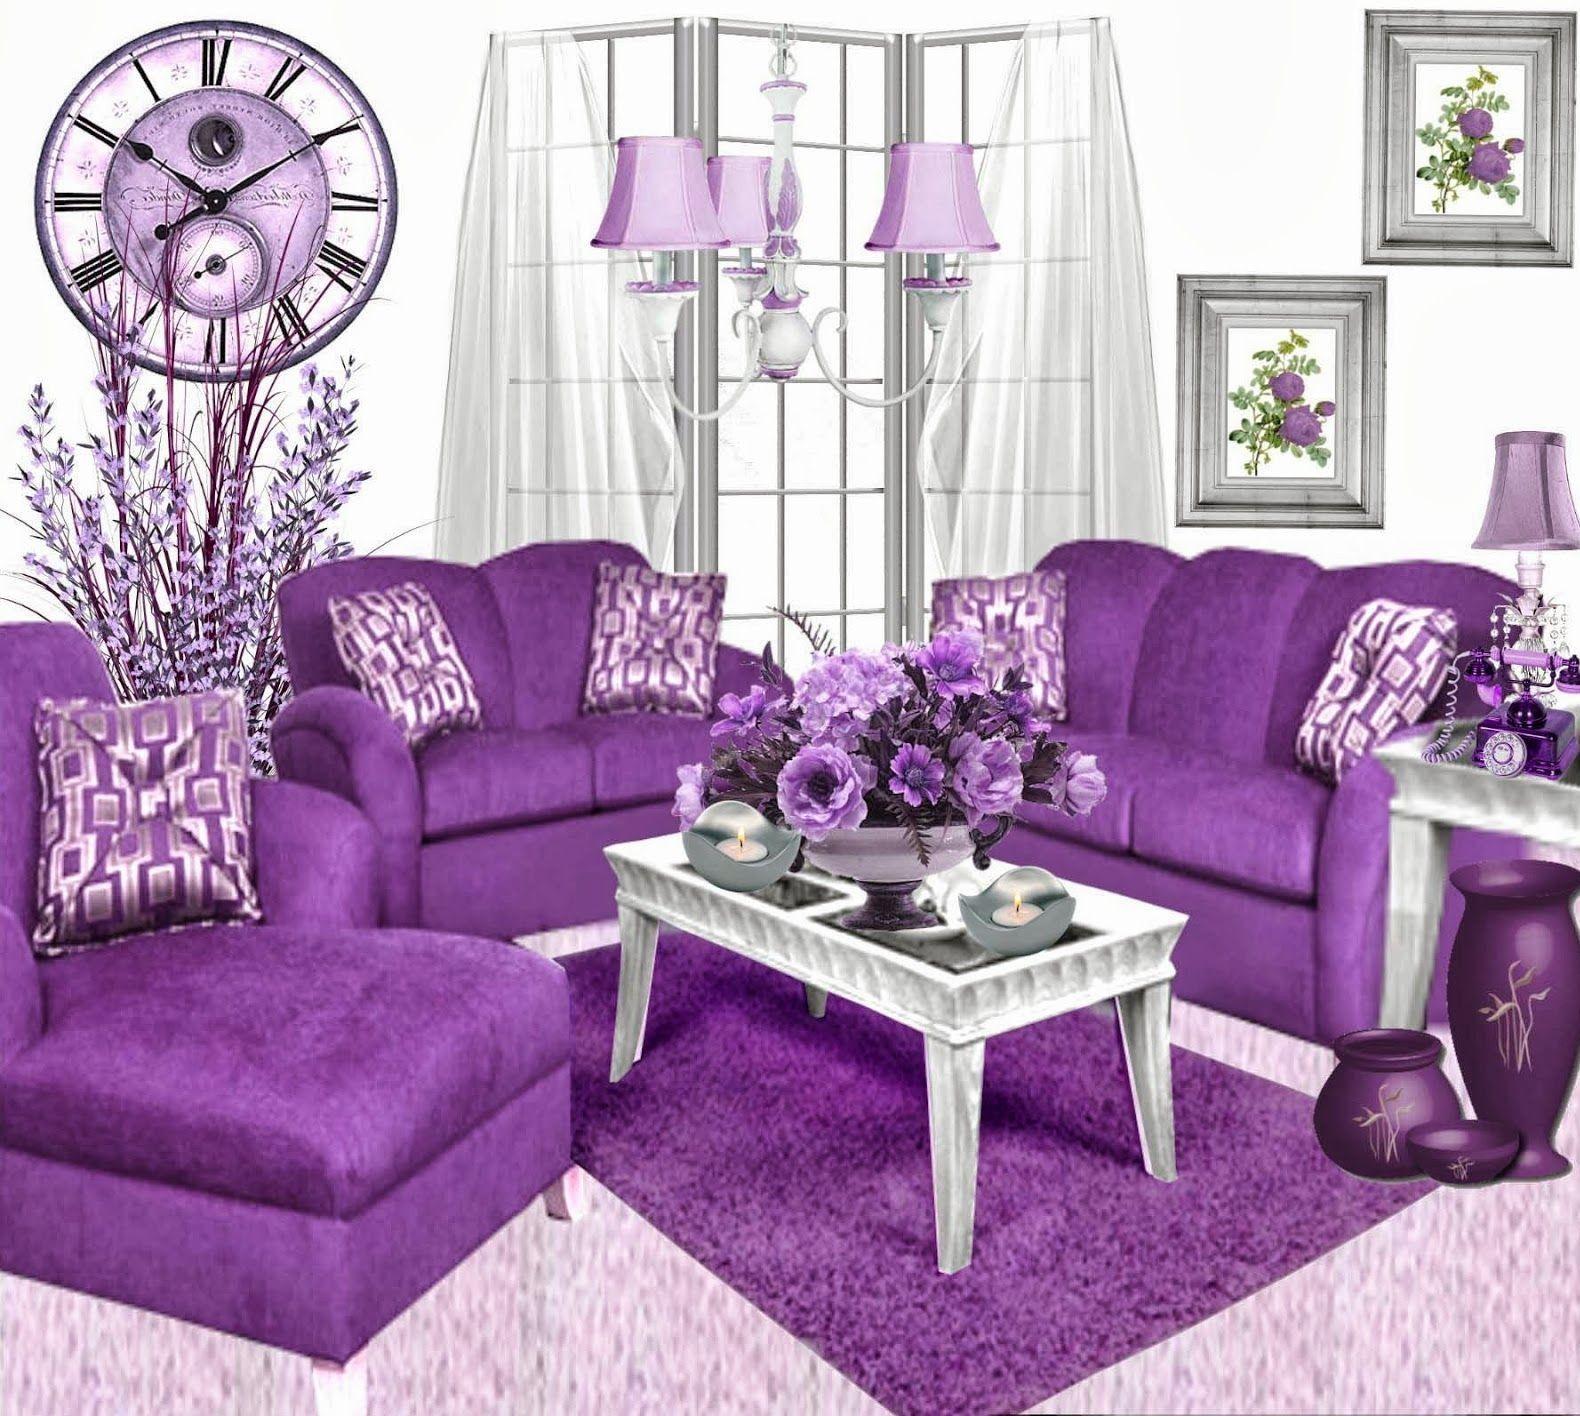 Purple Living Room Set Purple Furniture For Living Room Purple Sofas Purple Sets And P Purple Living Room Purple Furniture Purple Living Room Furniture Purple leather living room sets